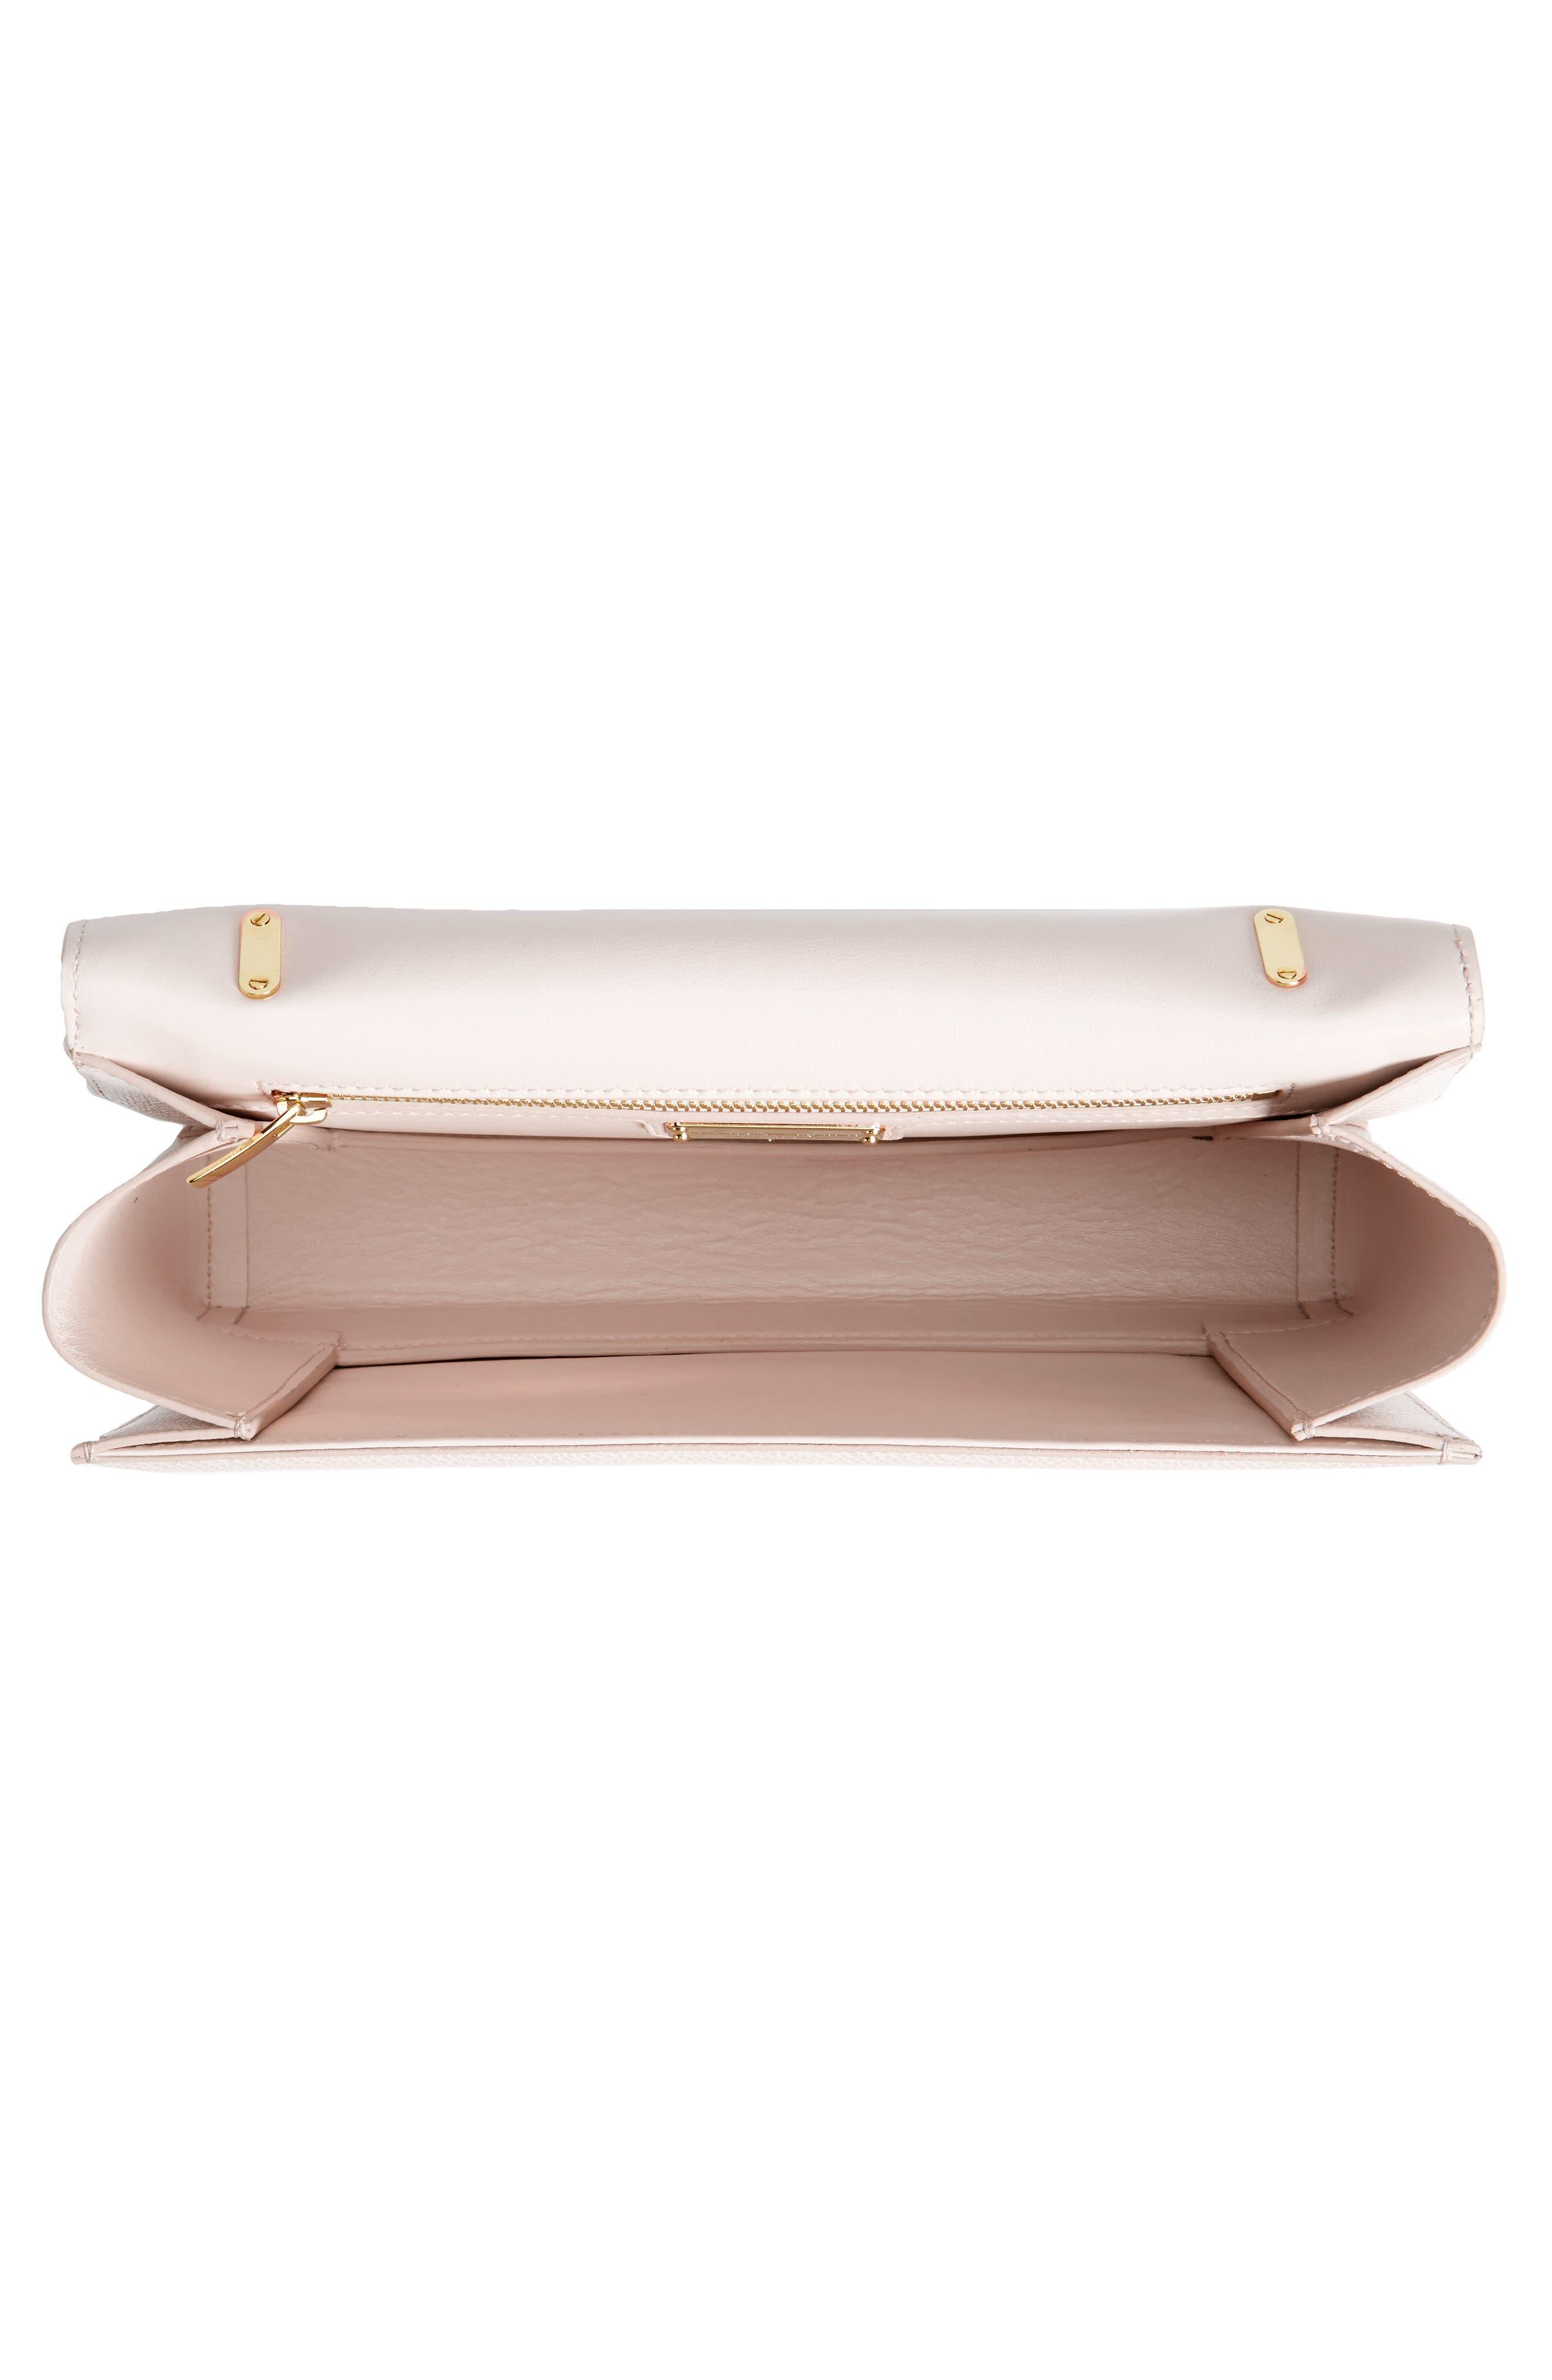 Medium Ginny Leather Shoulder Bag,                             Alternate thumbnail 4, color,                             Jasmine Flower